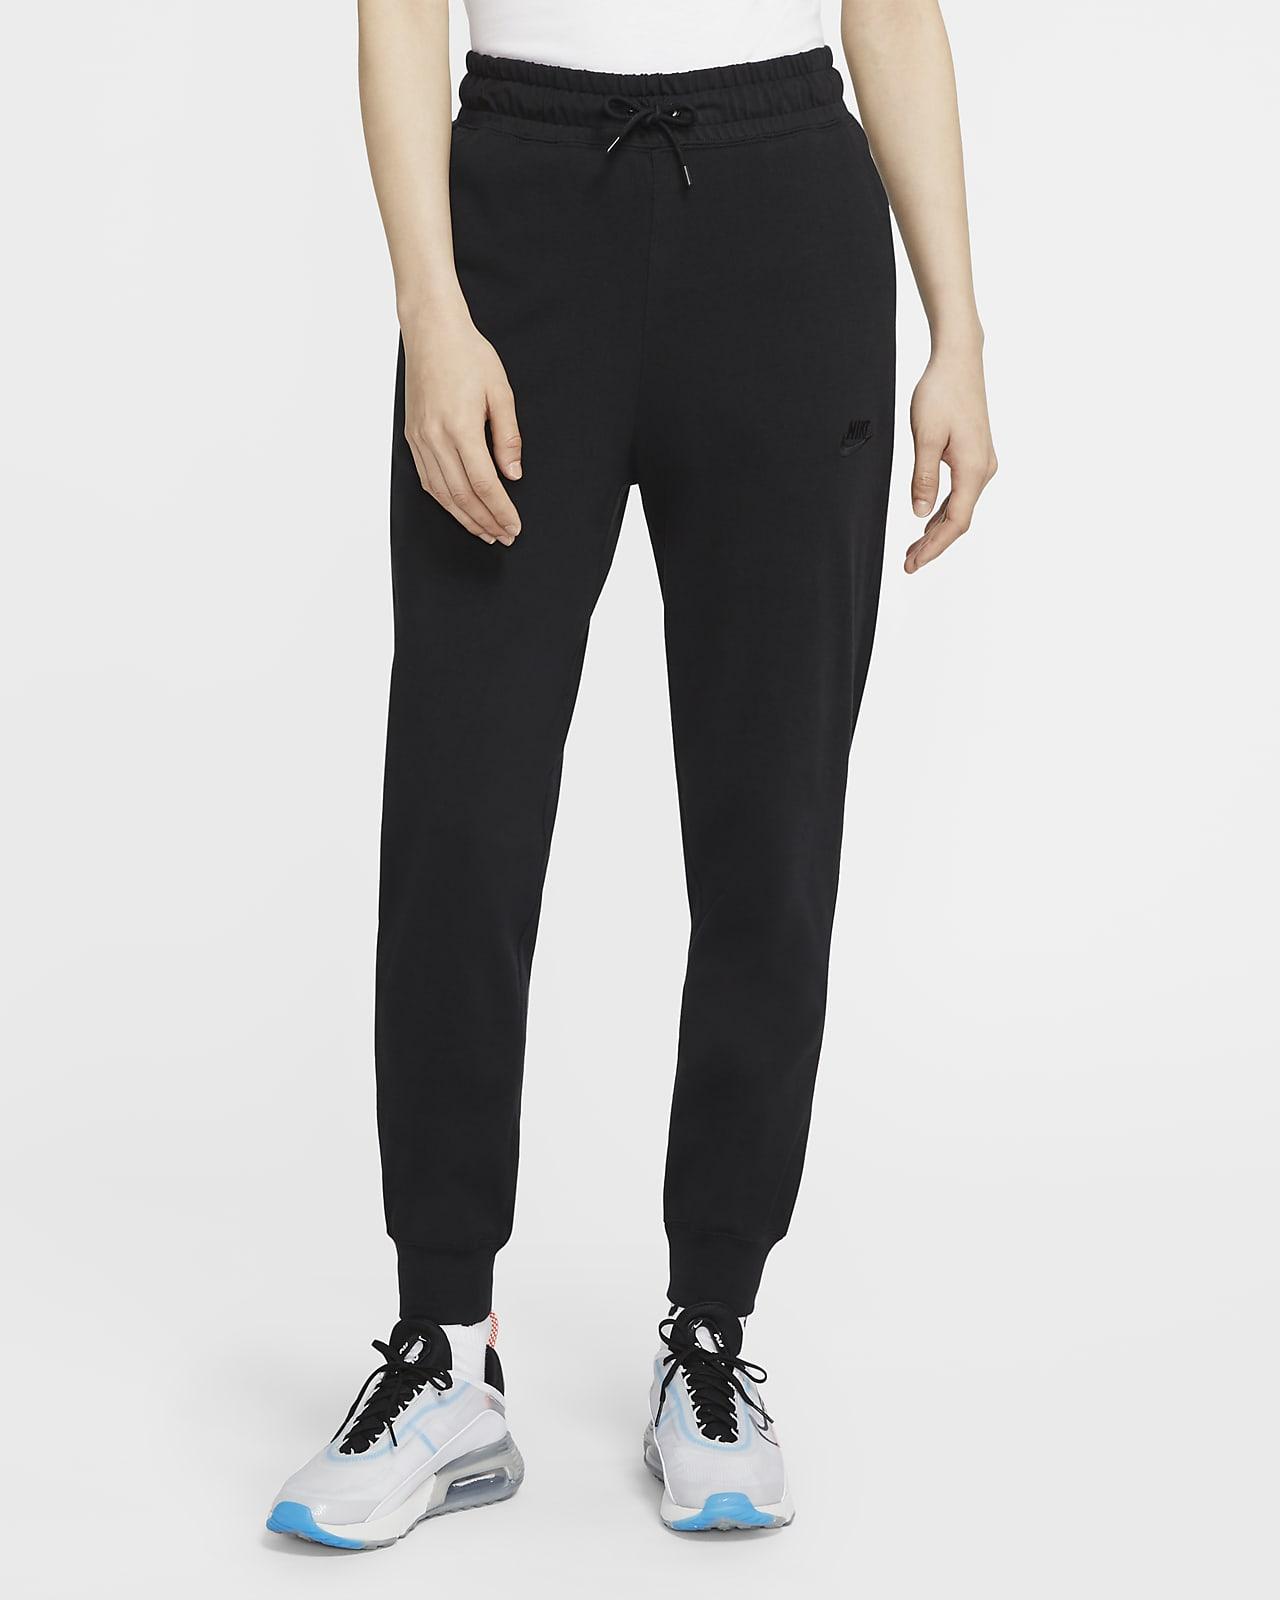 Nike Sportswear 女子针织长裤